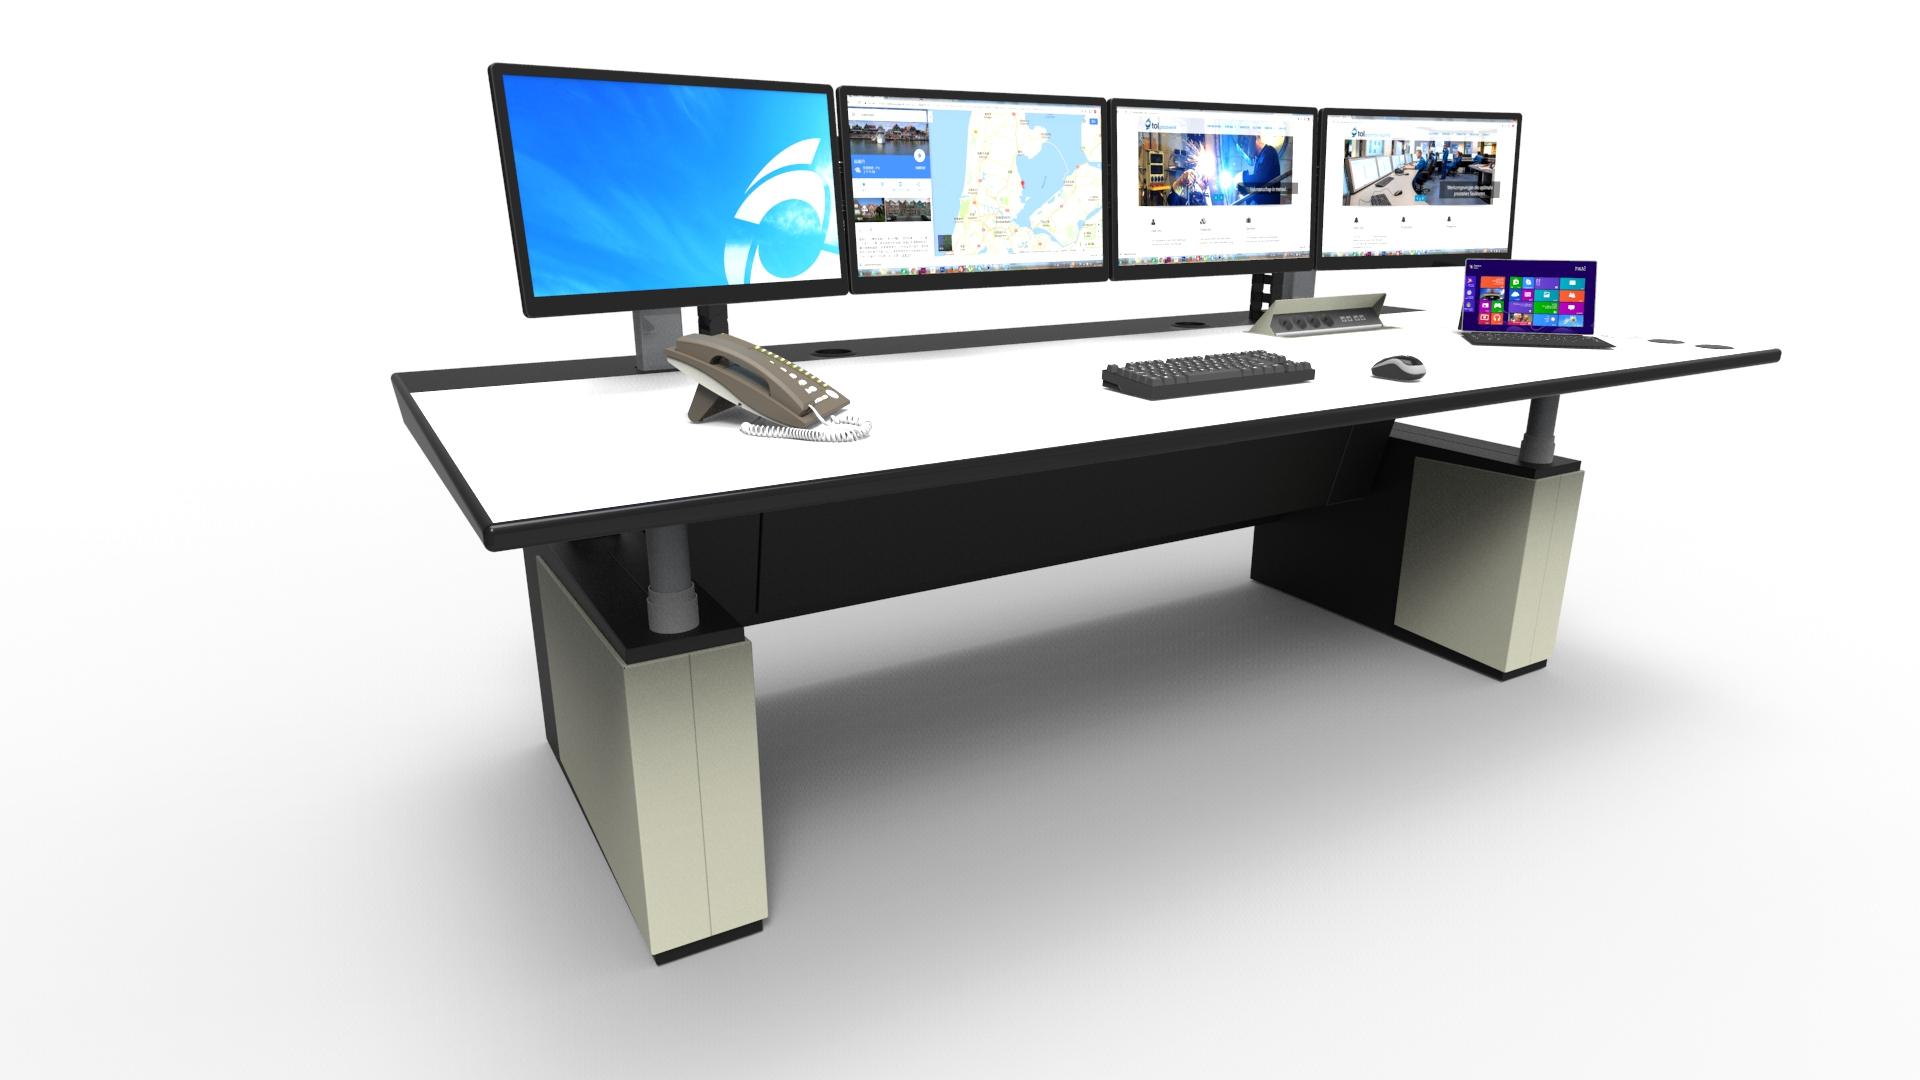 amazon desktop desk com office dual iyhjl height black uprite dp ergo monitor workstation adjustable products